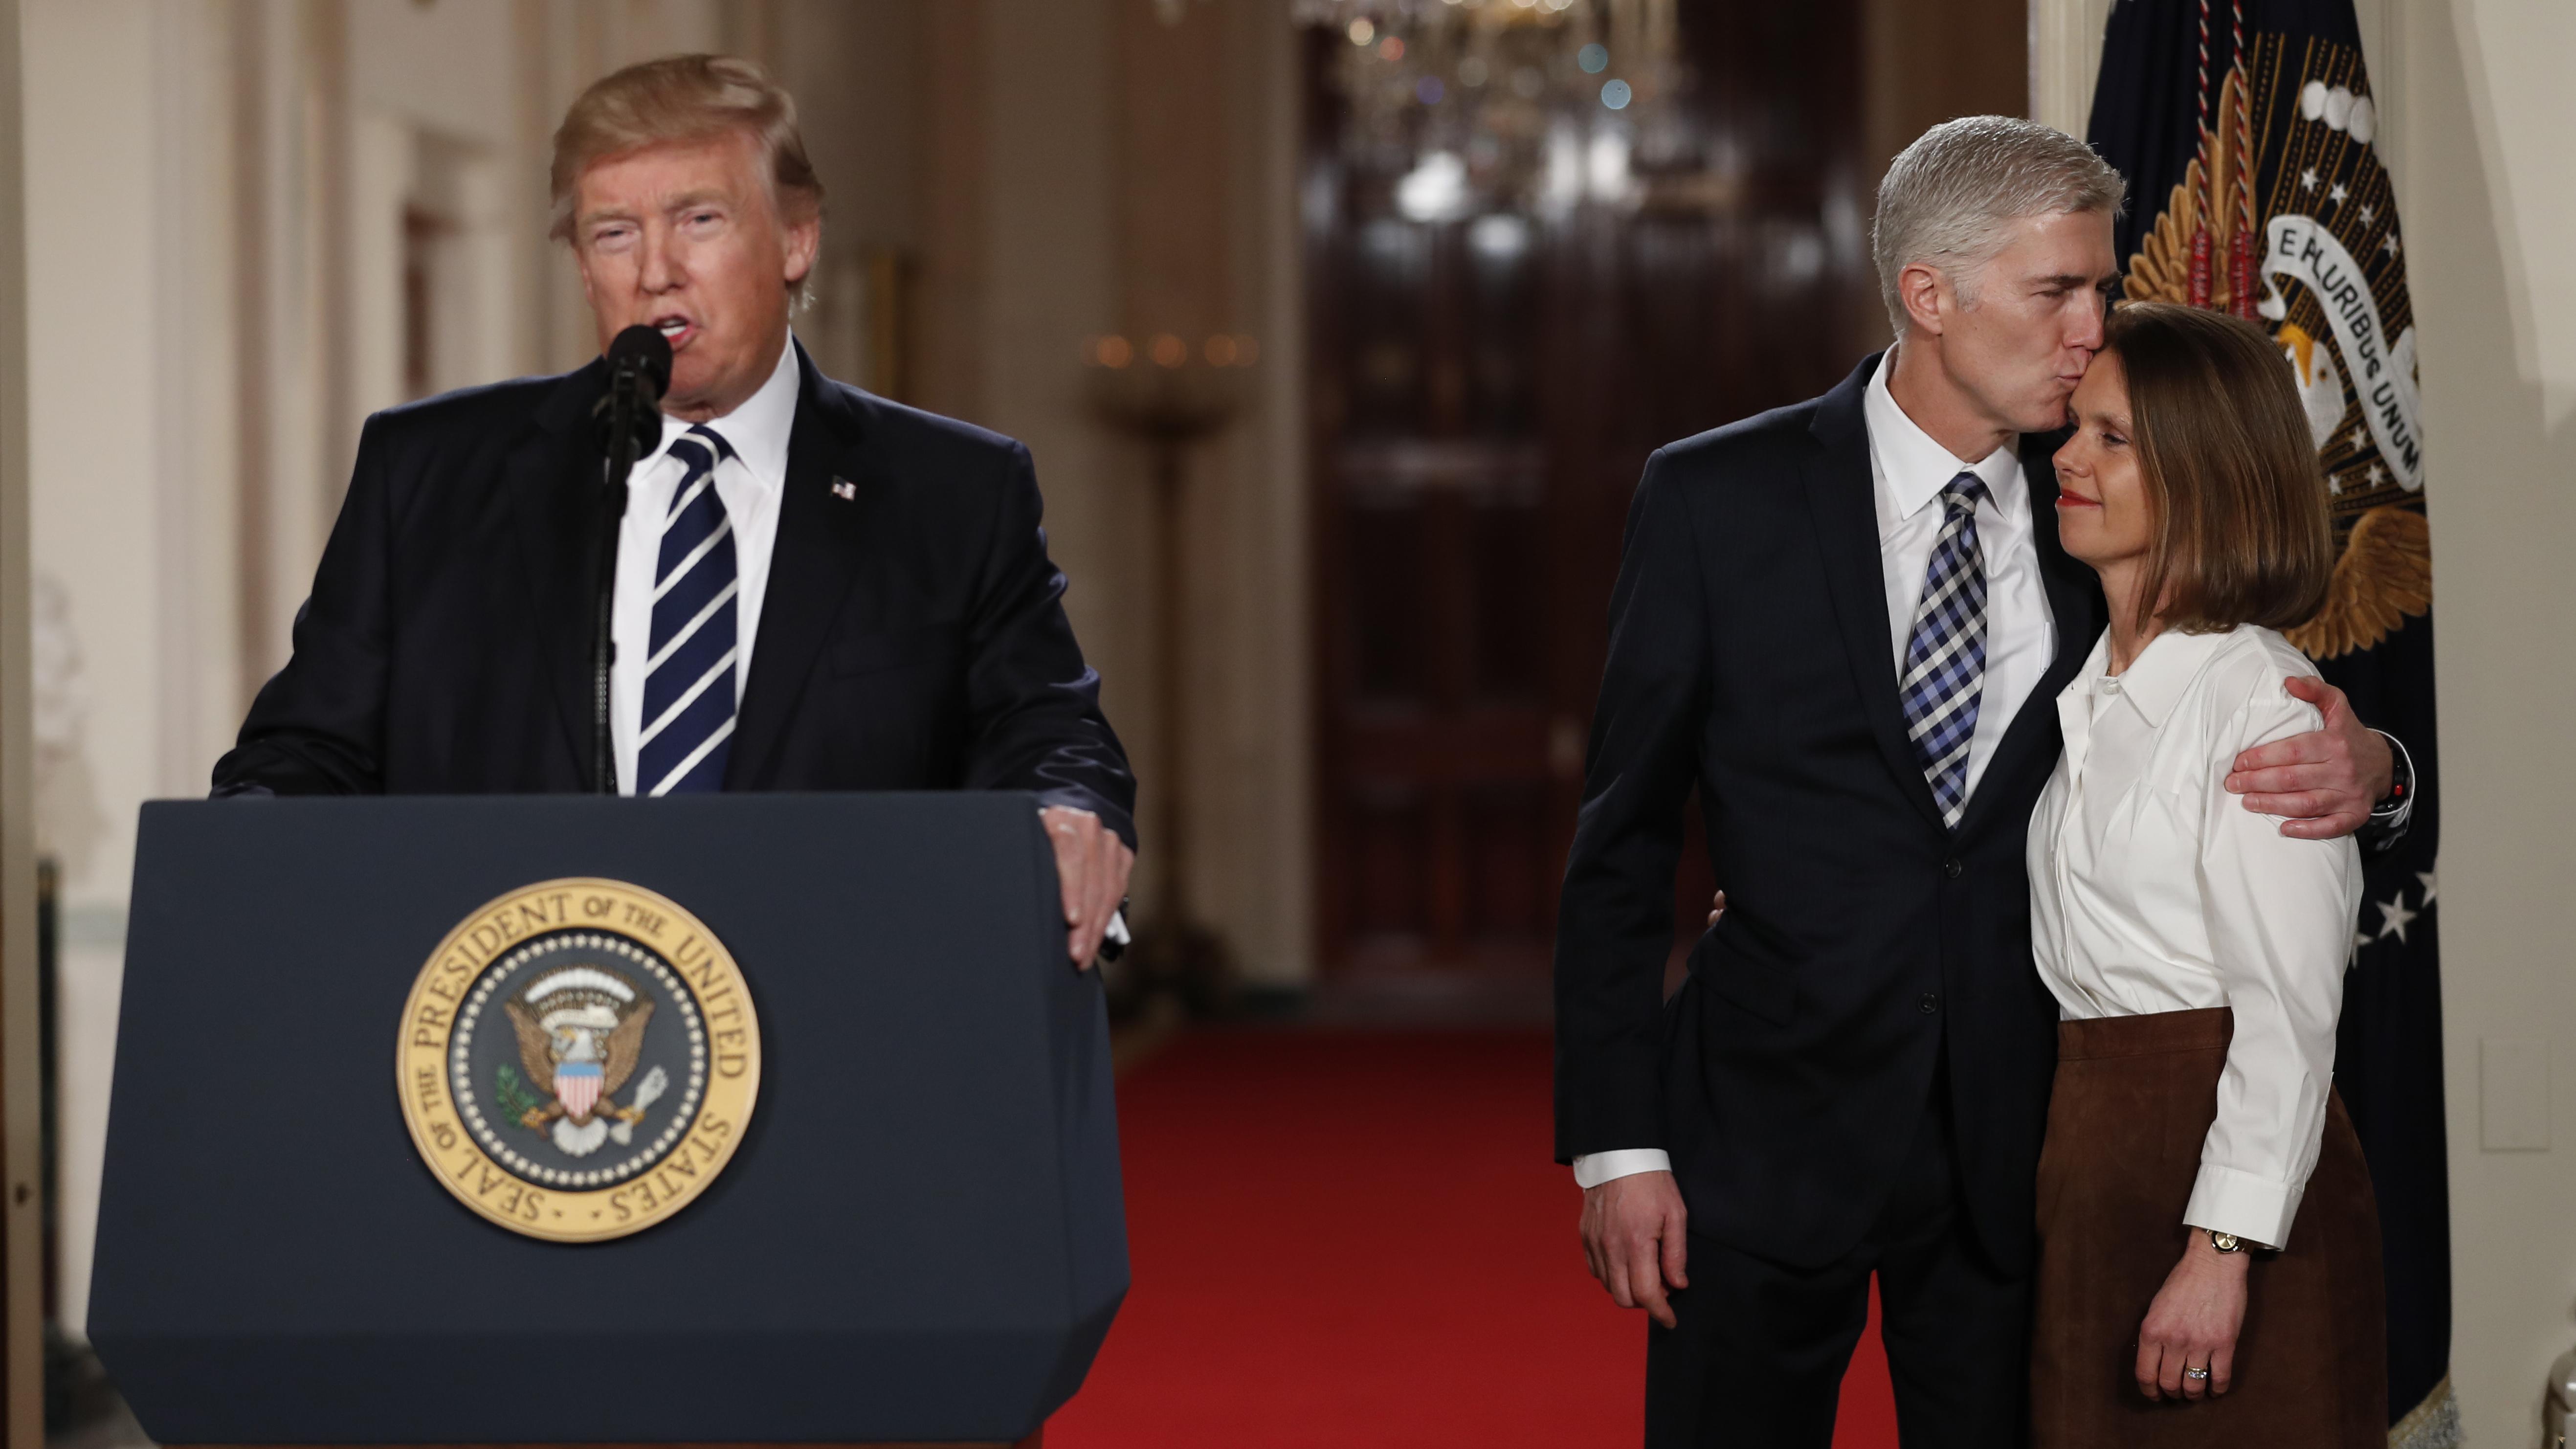 Donald Trump Nominates Neil Gorsuch for the Supreme Court